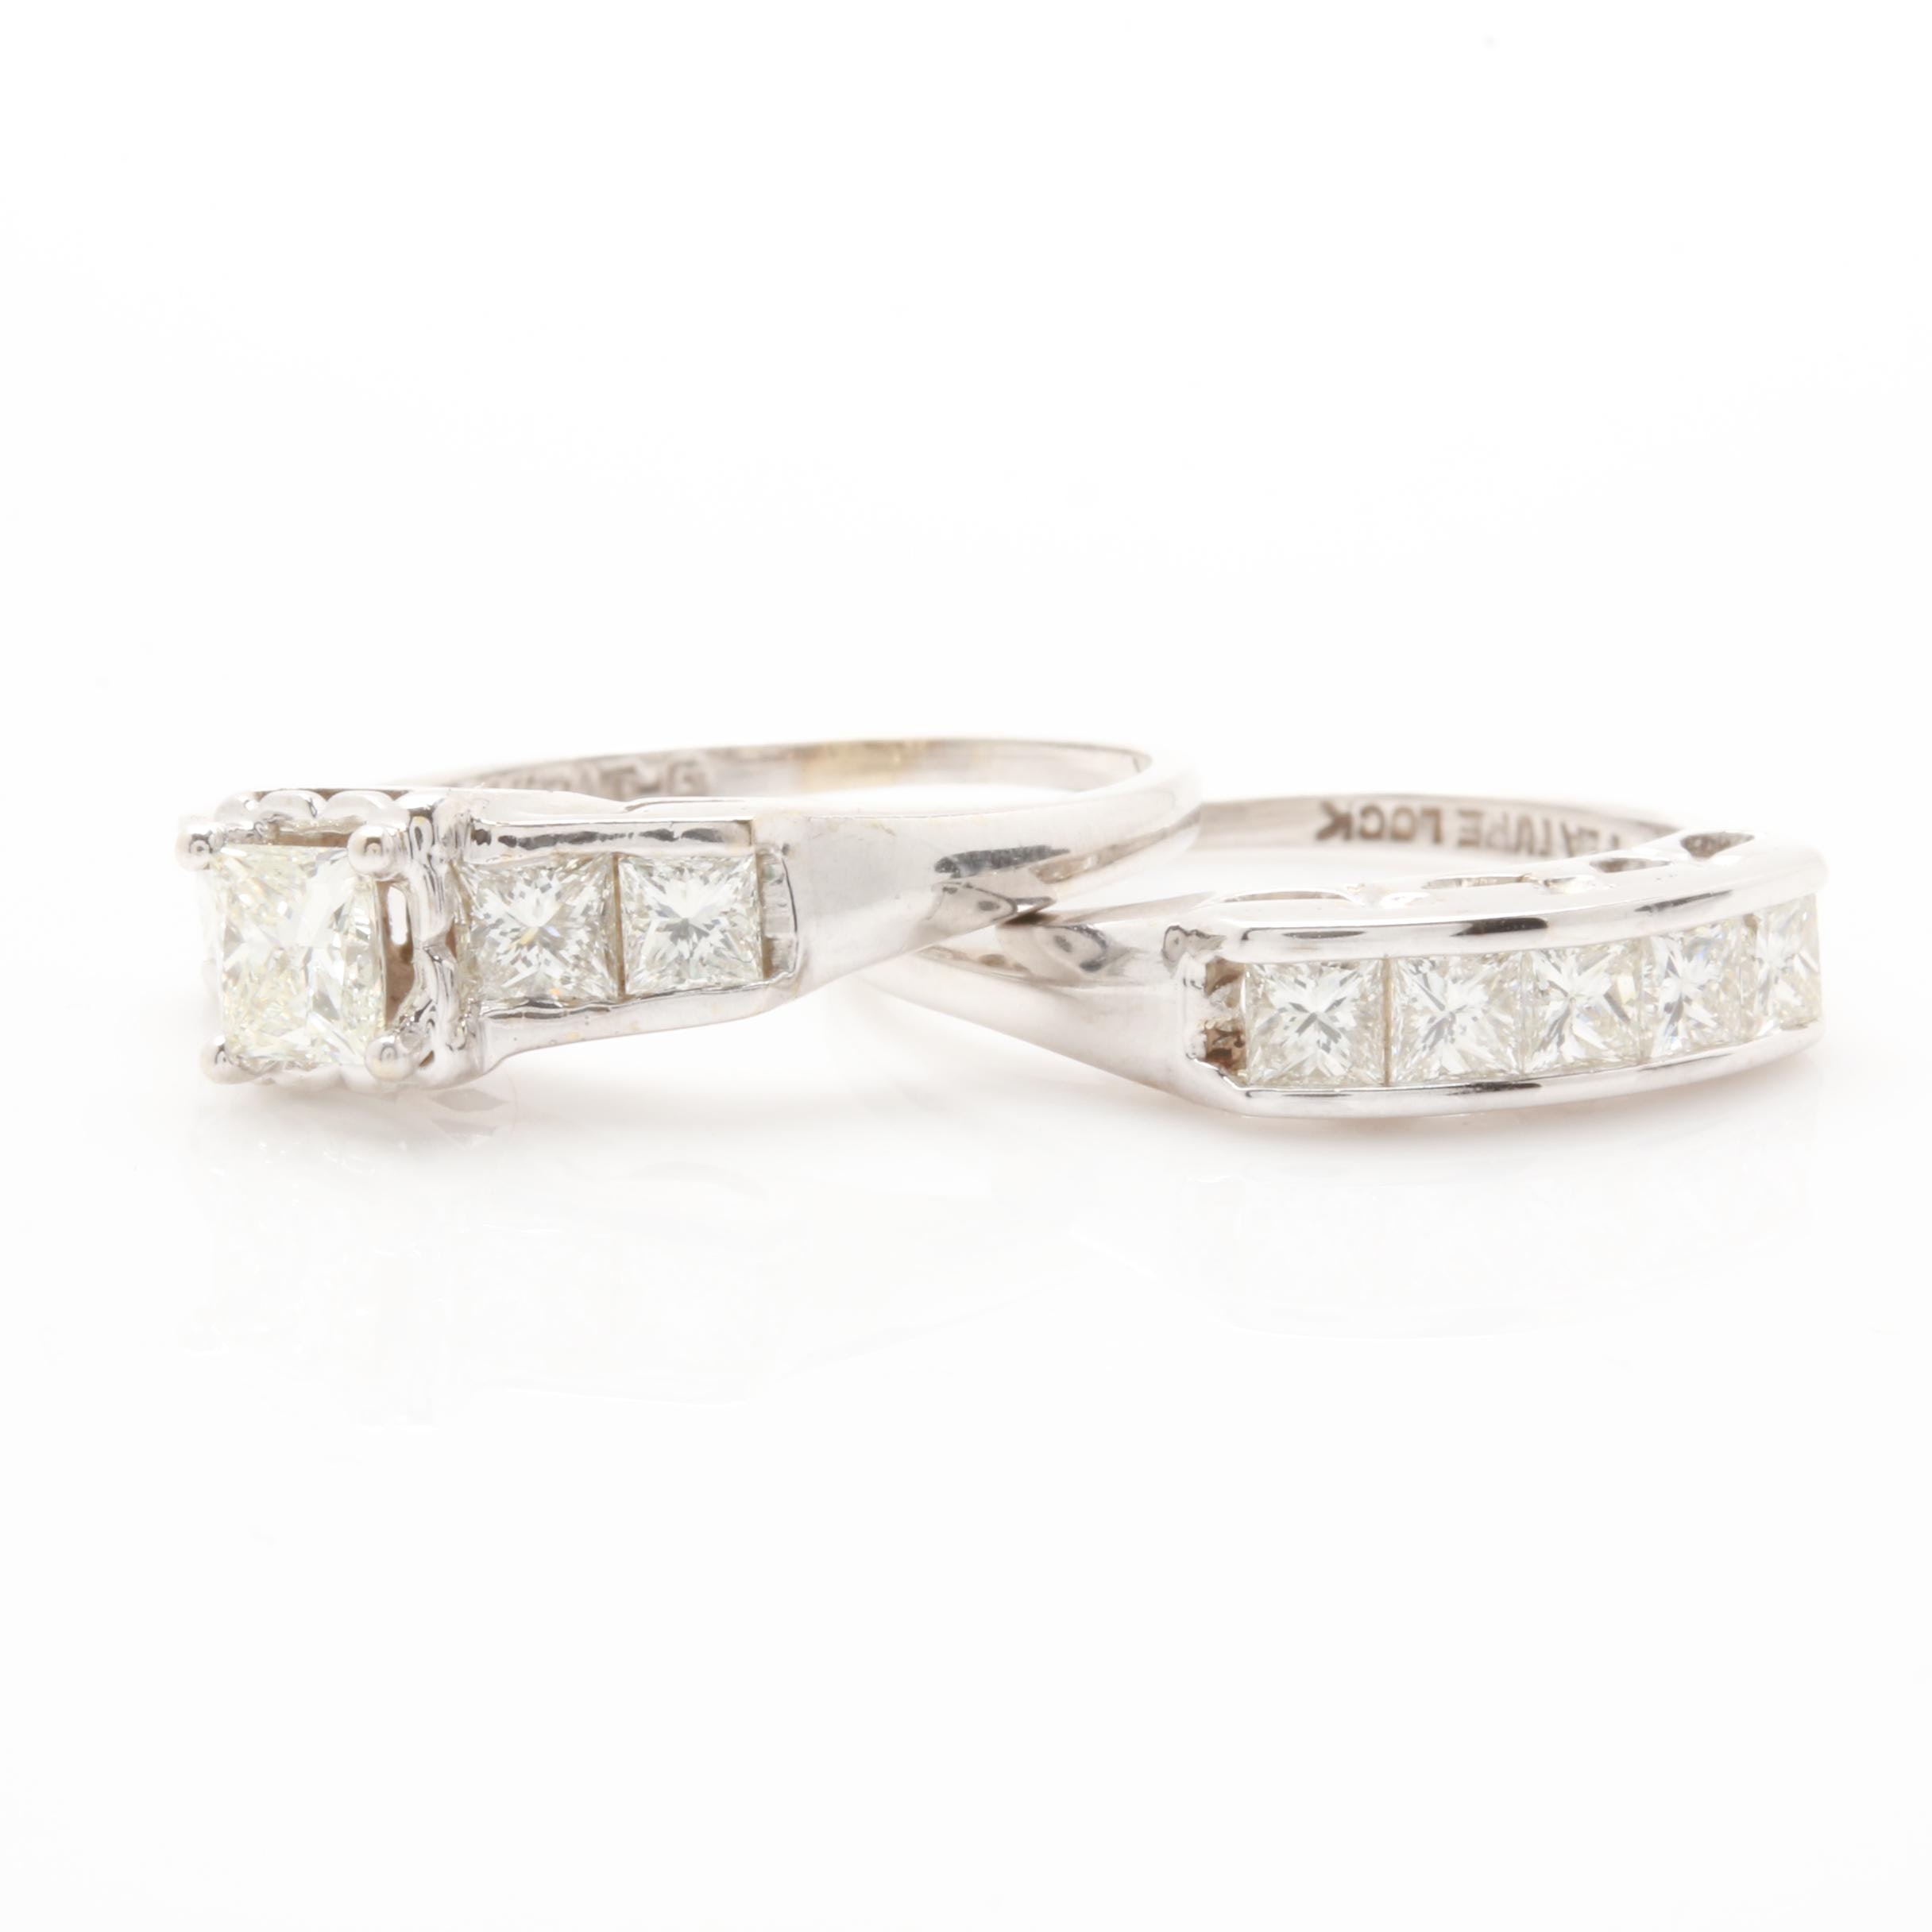 14K White Gold 2.34 CTW Diamond Ring Set